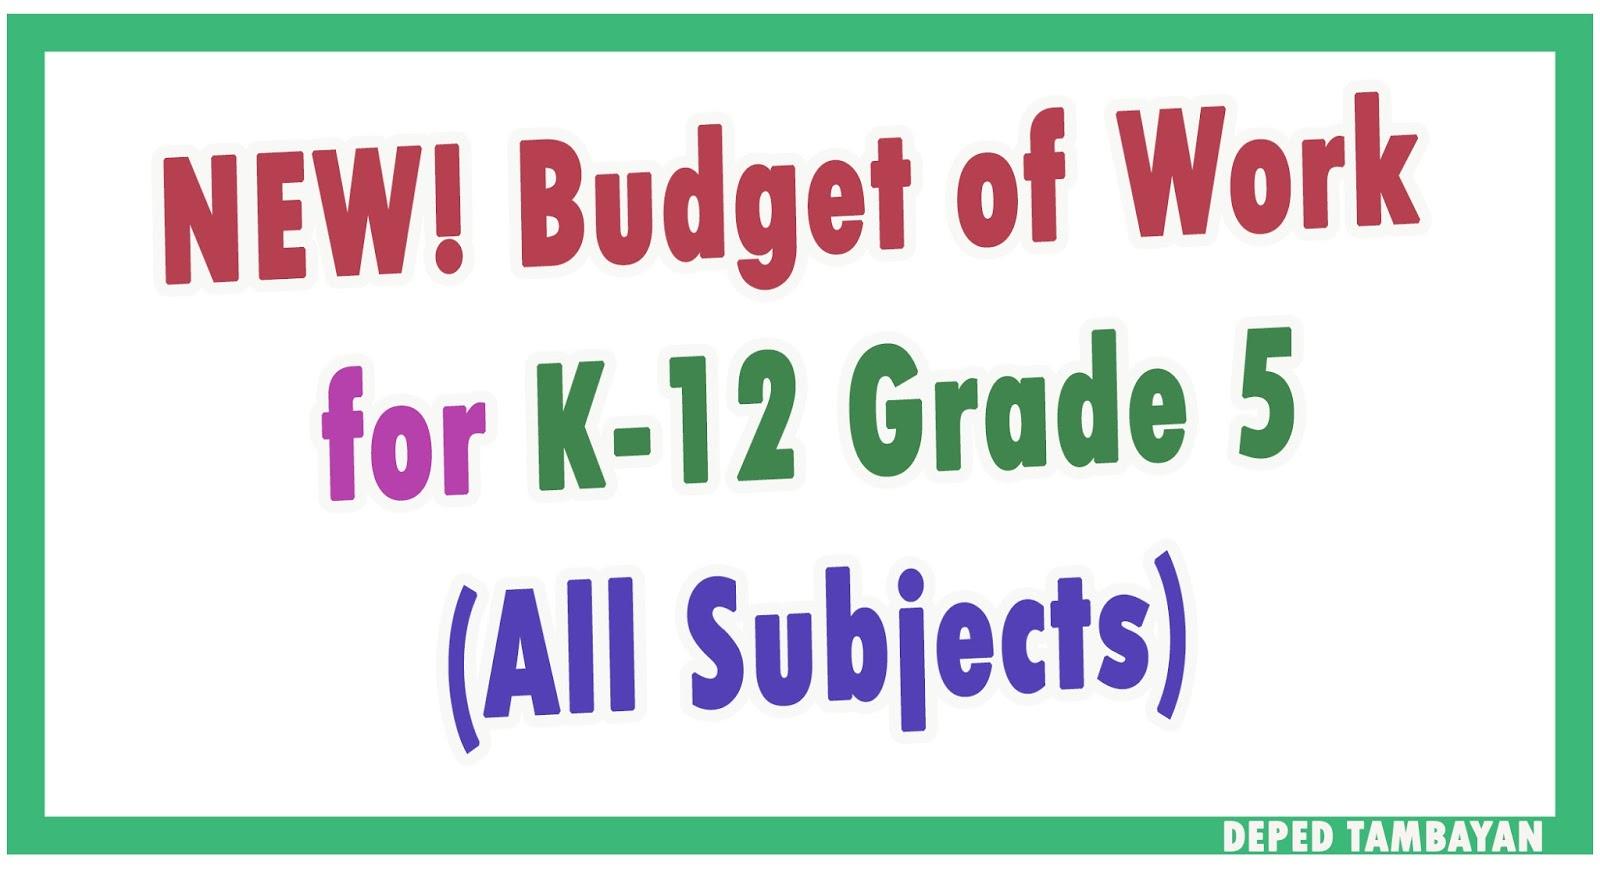 NEW K-12 Budget of Work for Grade 5 | DEPED TAMBAYAN PH